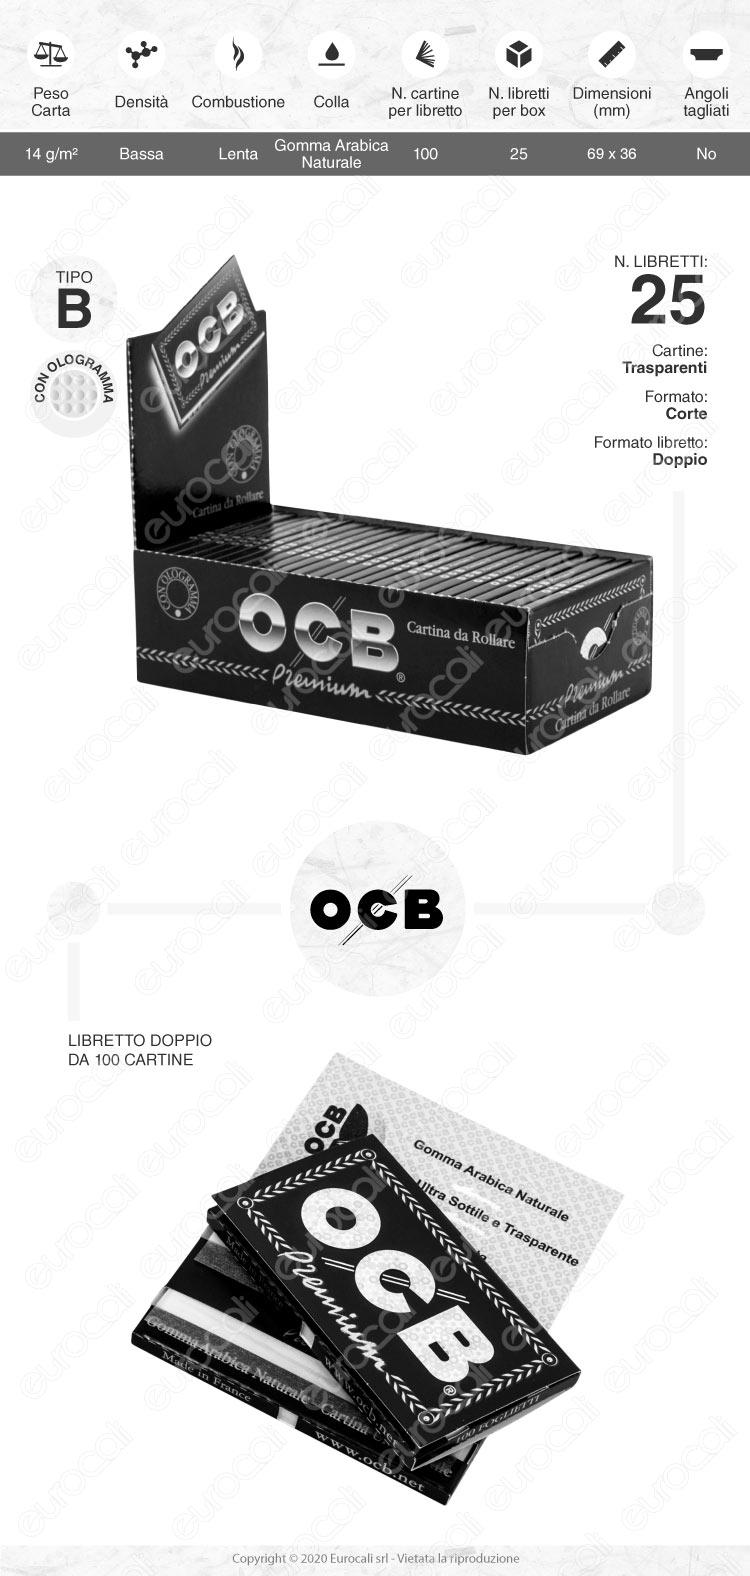 Cartine OCB Nere Premium Corte Doppie